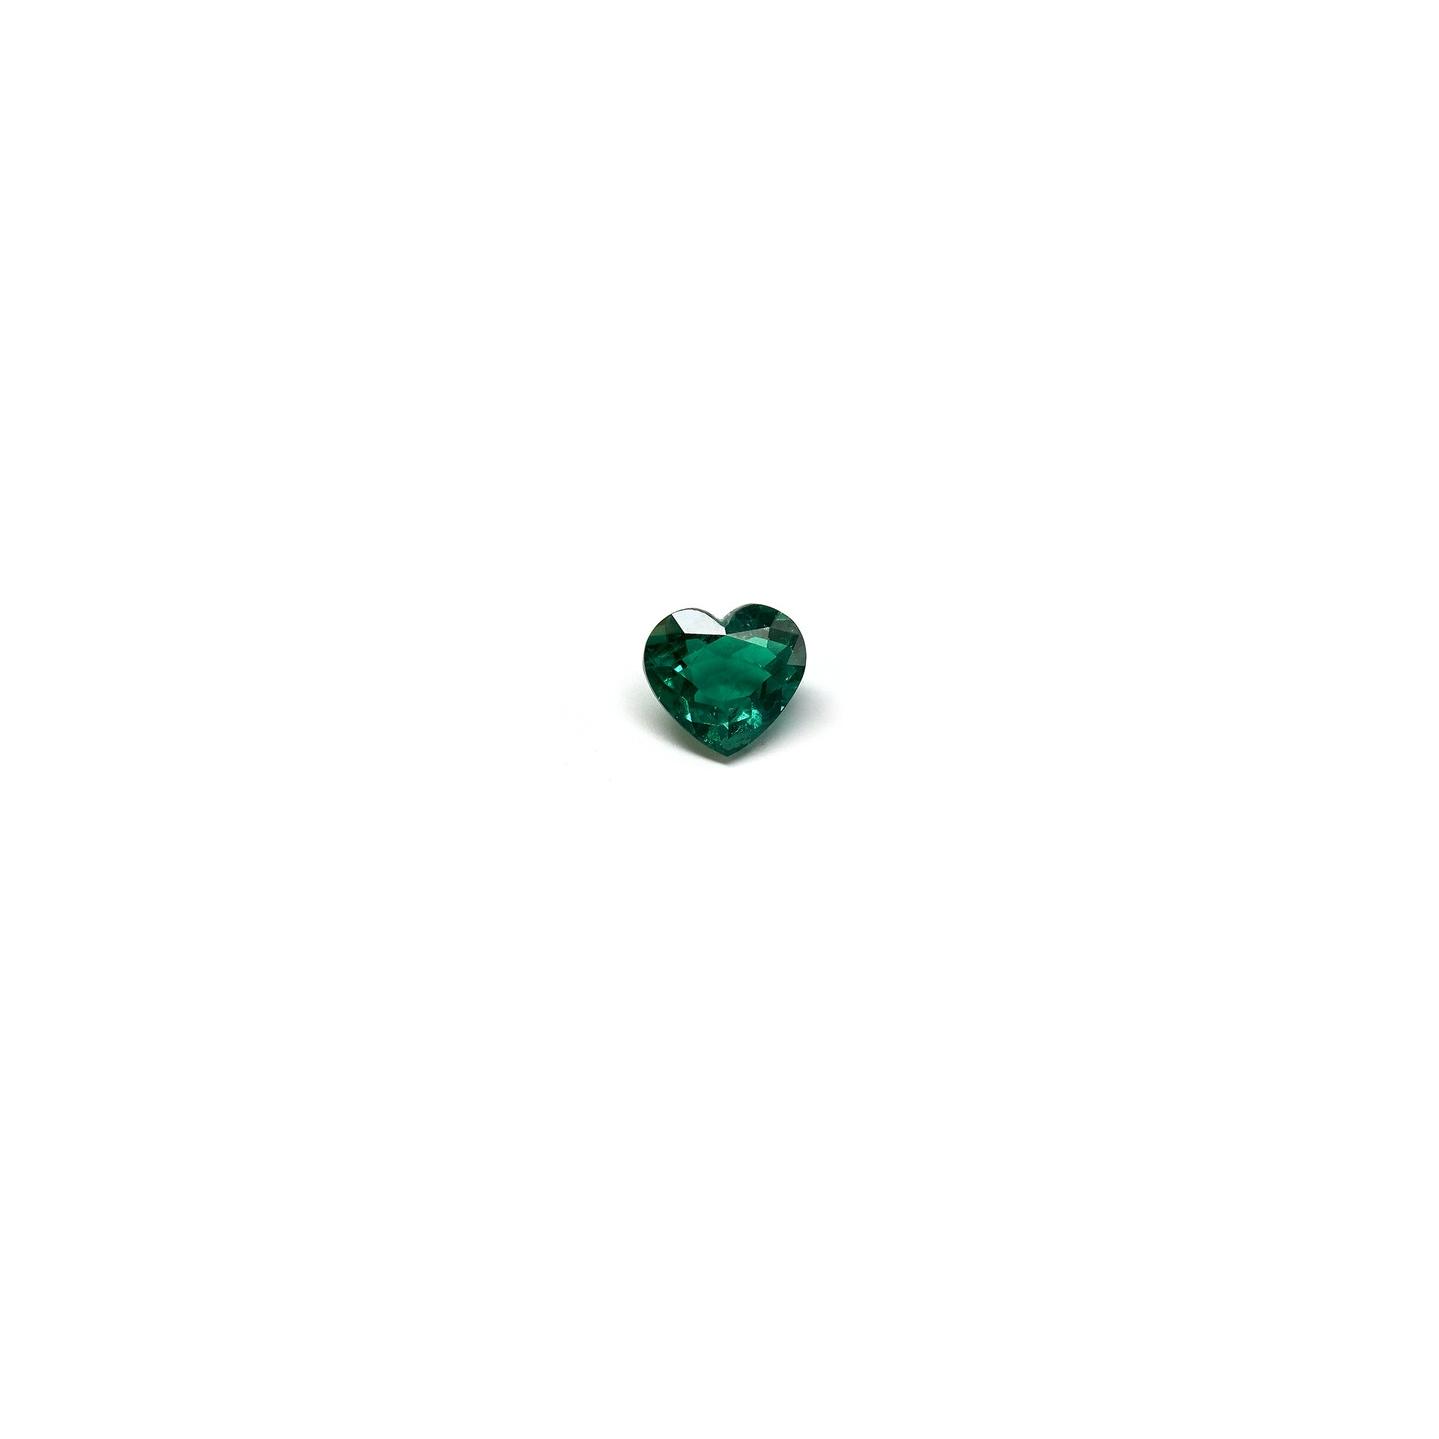 5 carat heart shaped